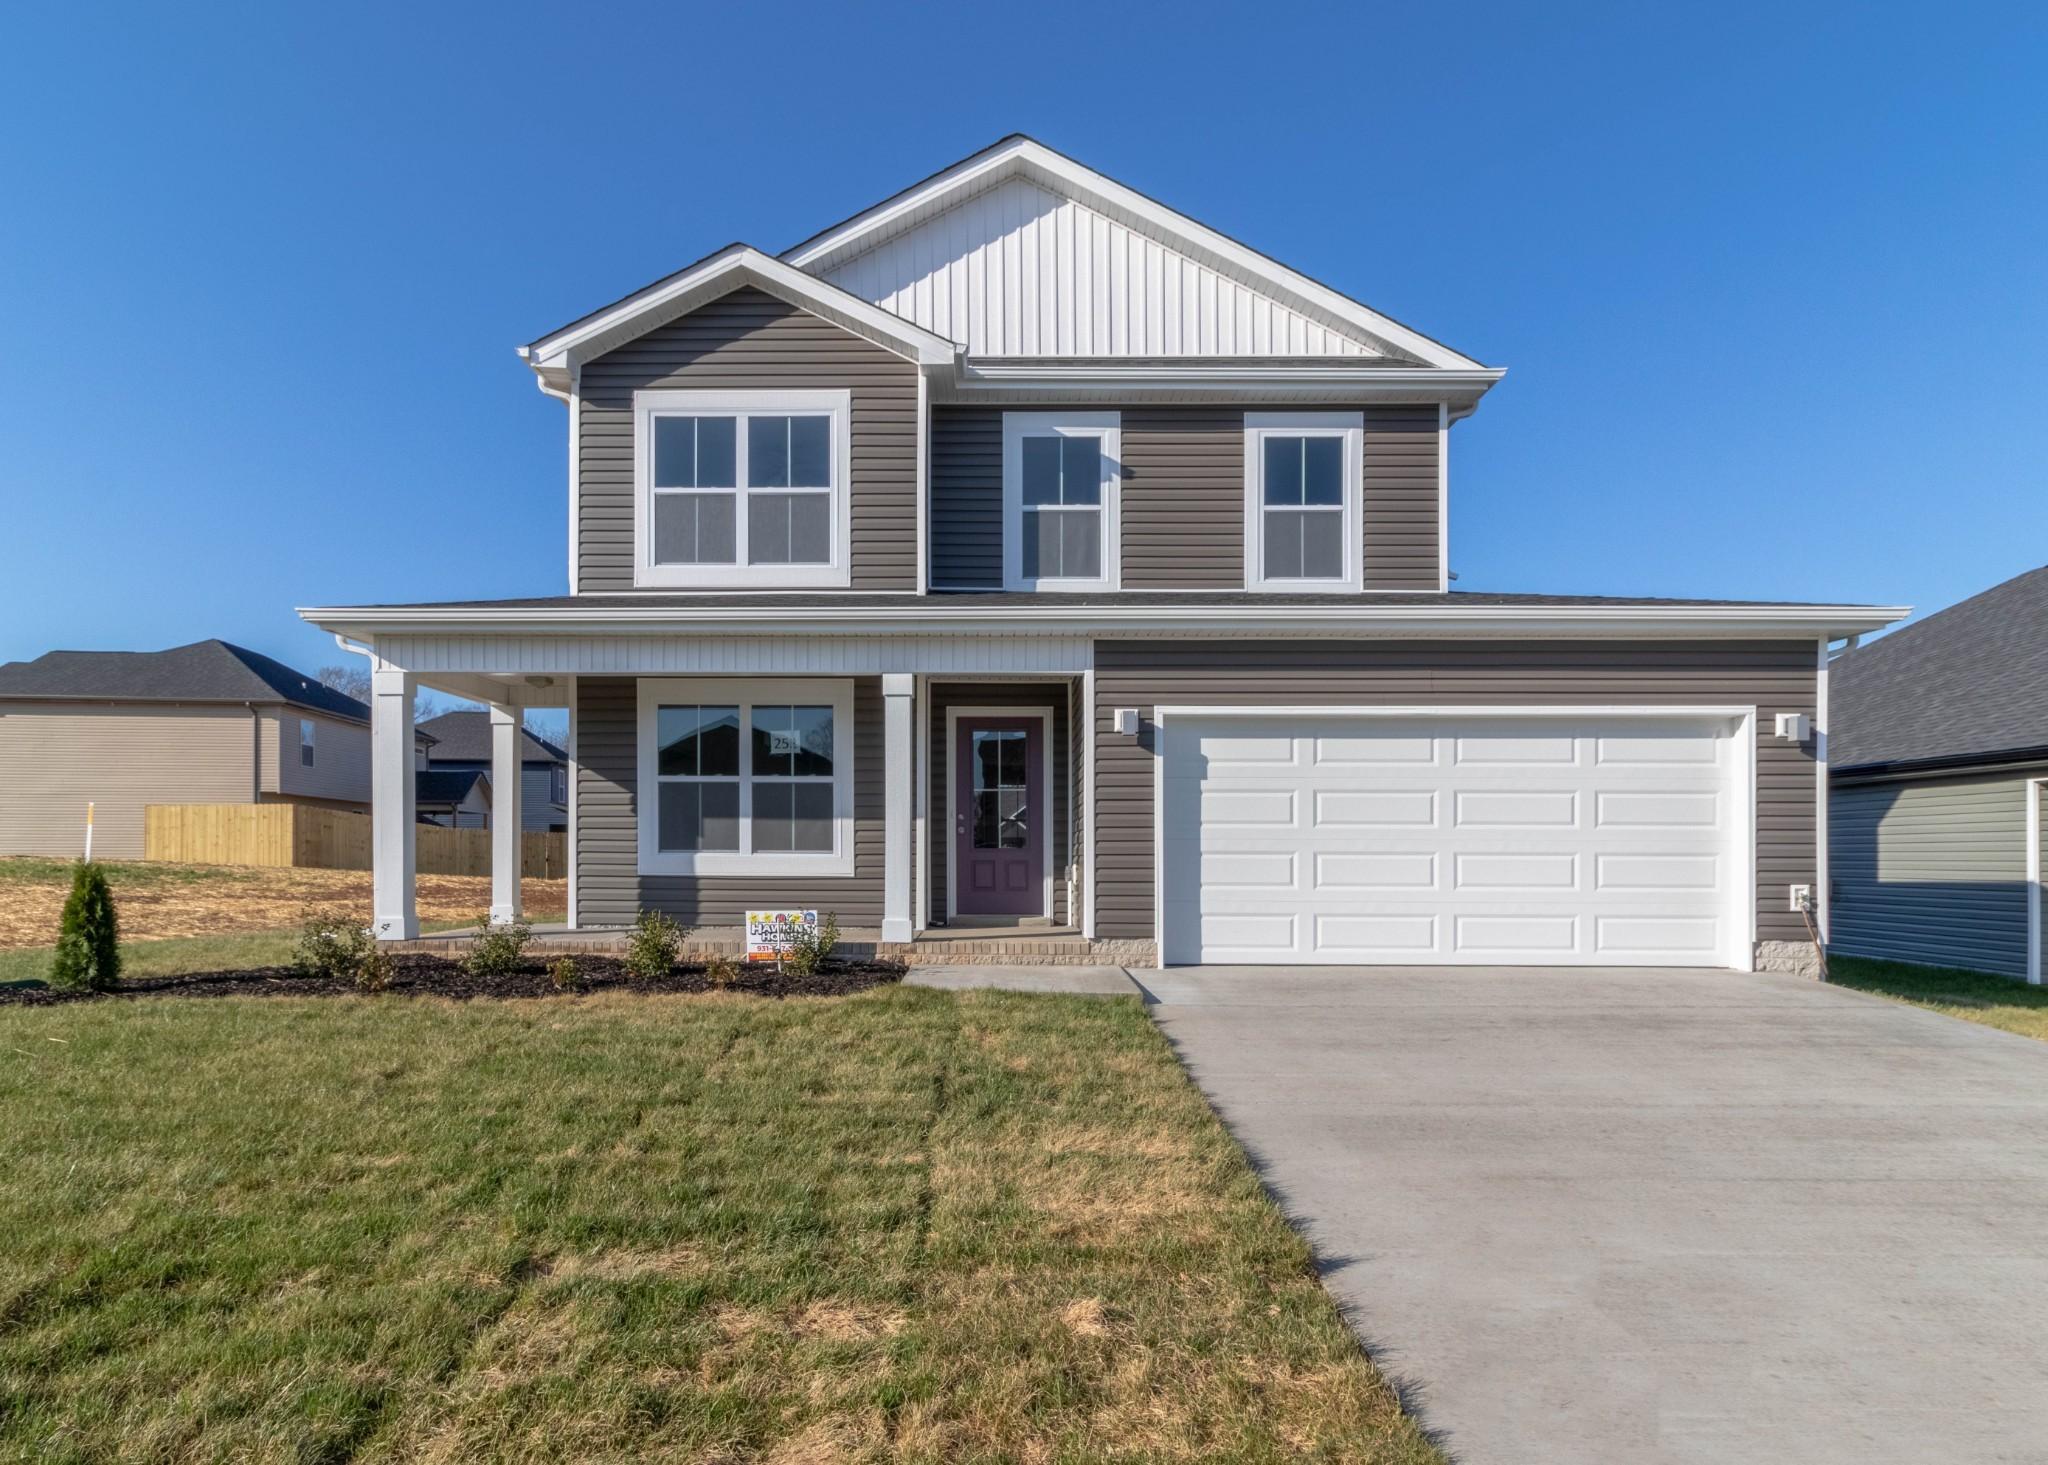 367 Eagles Bluff, Clarksville, TN 37040 - Clarksville, TN real estate listing